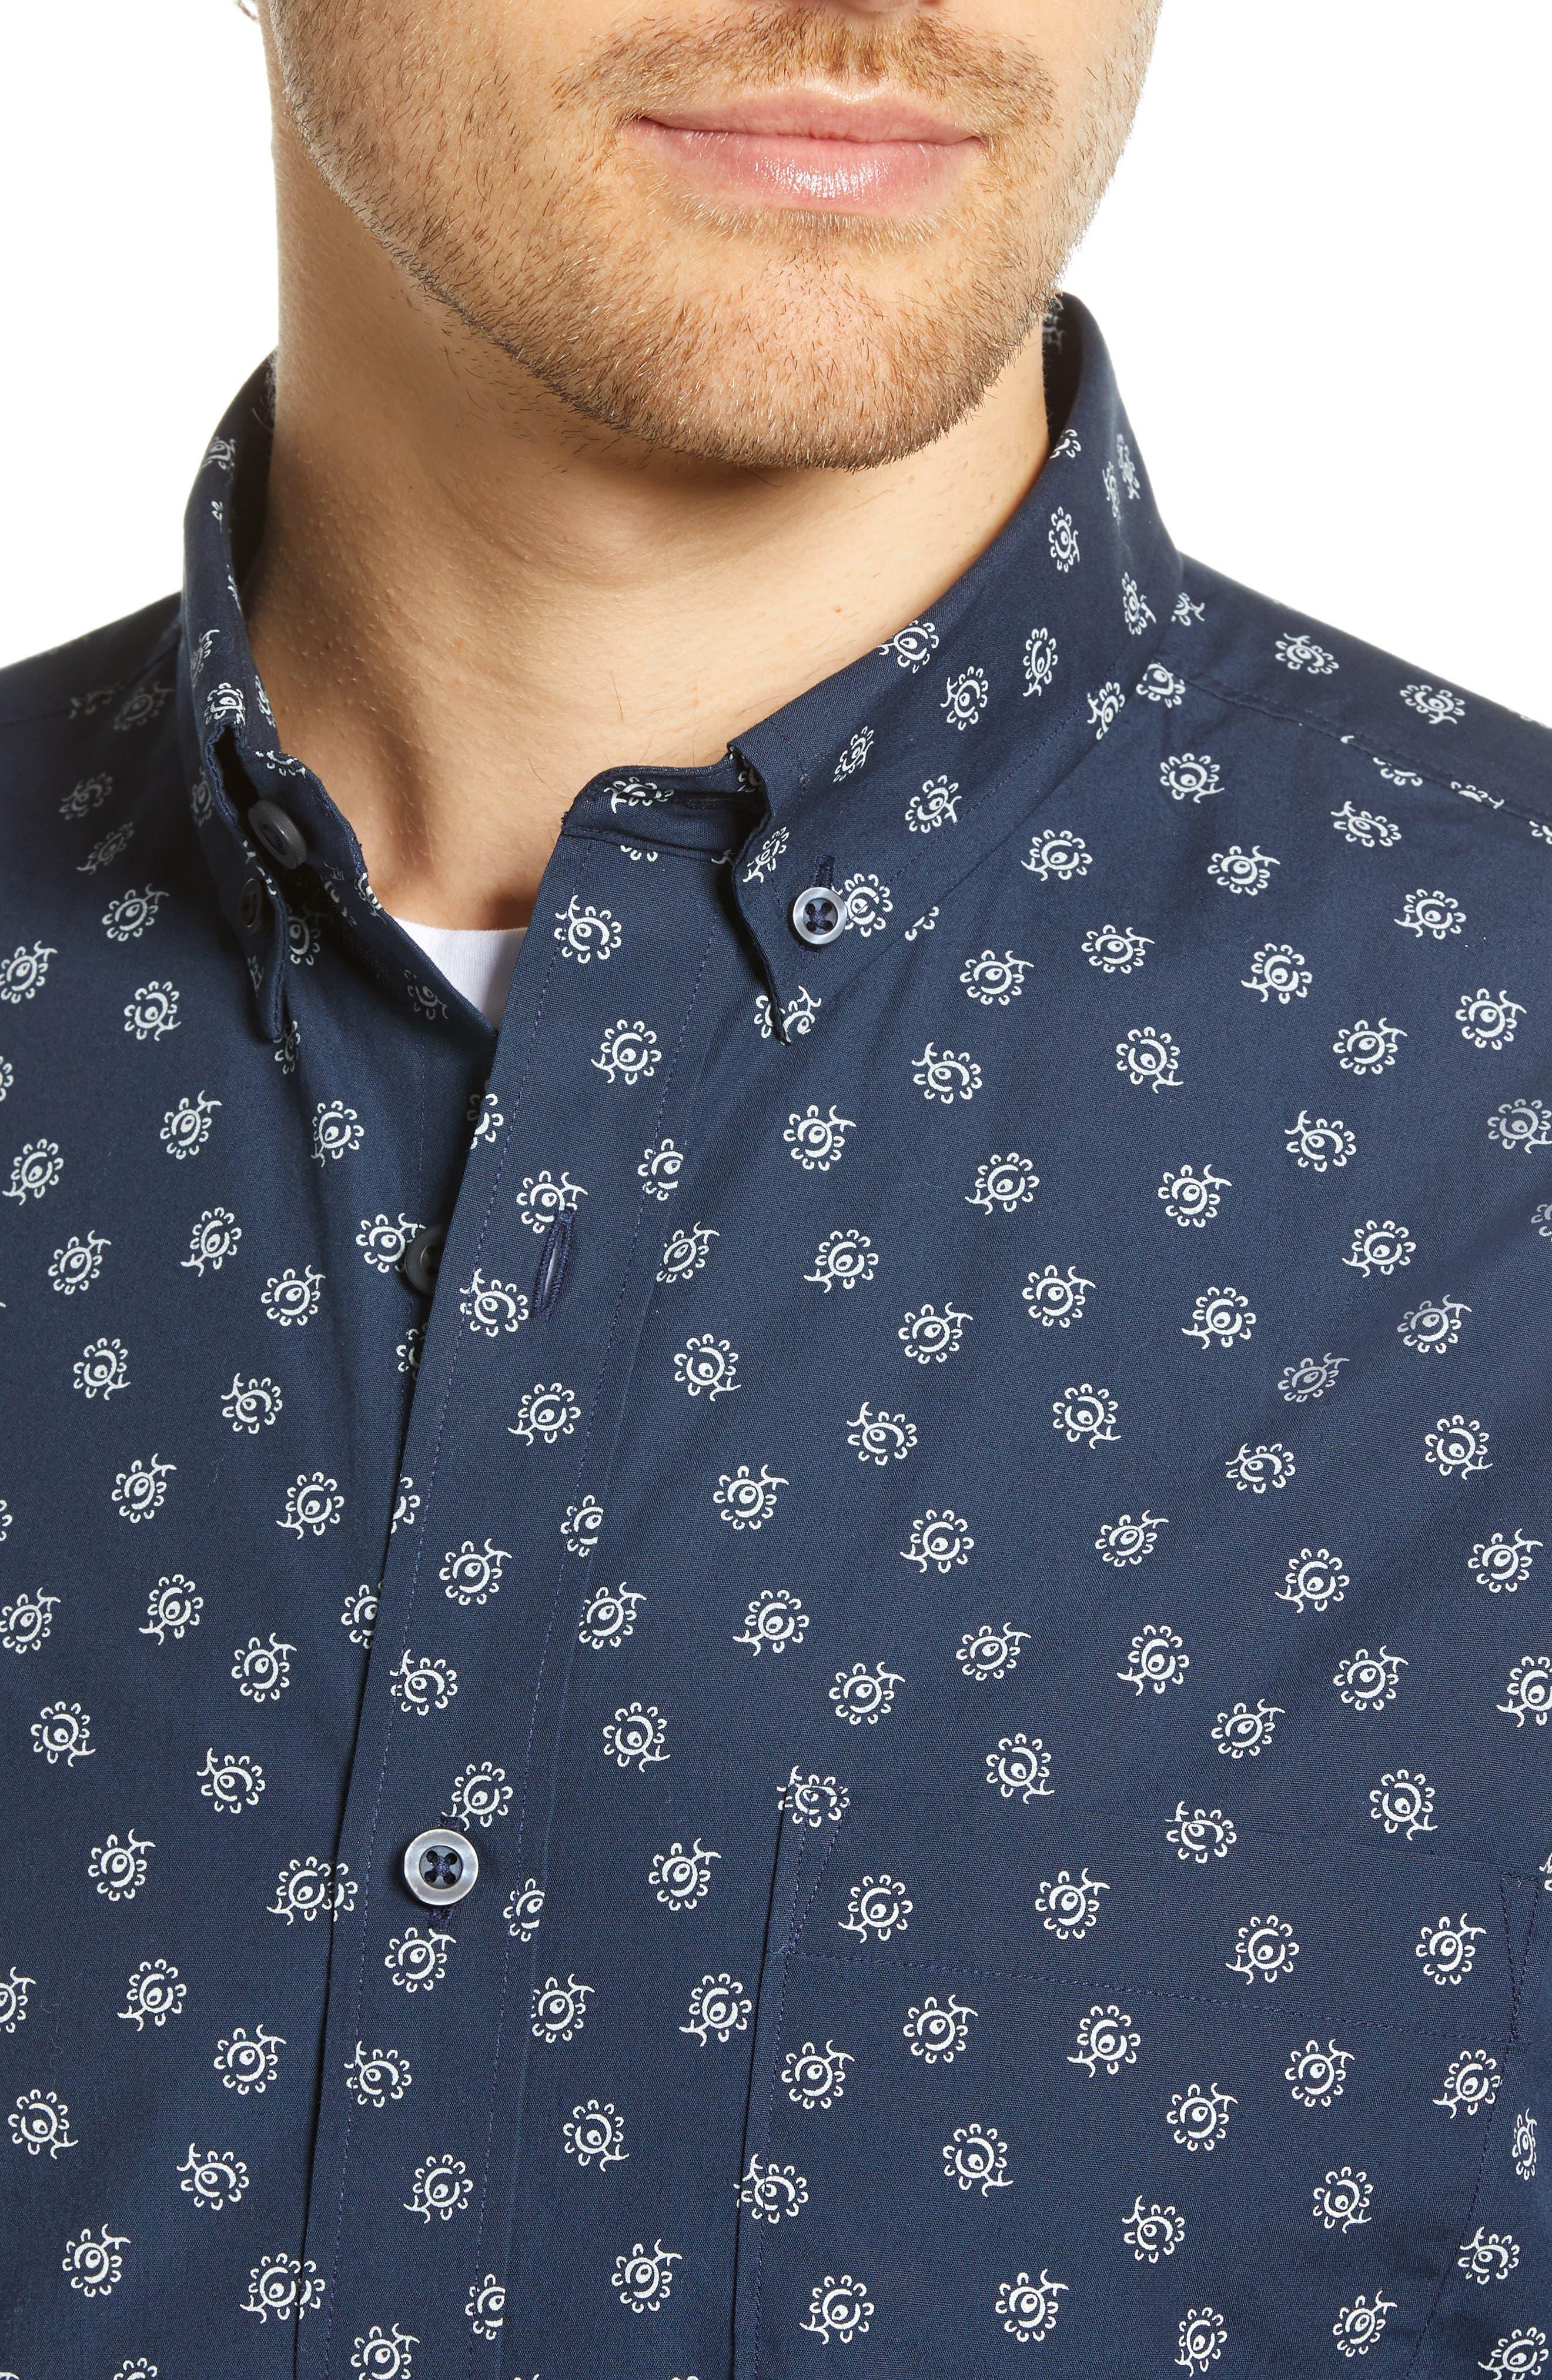 Floral Print Sport Shirt,                             Alternate thumbnail 2, color,                             NAVY IRIS FLORAL PRINT